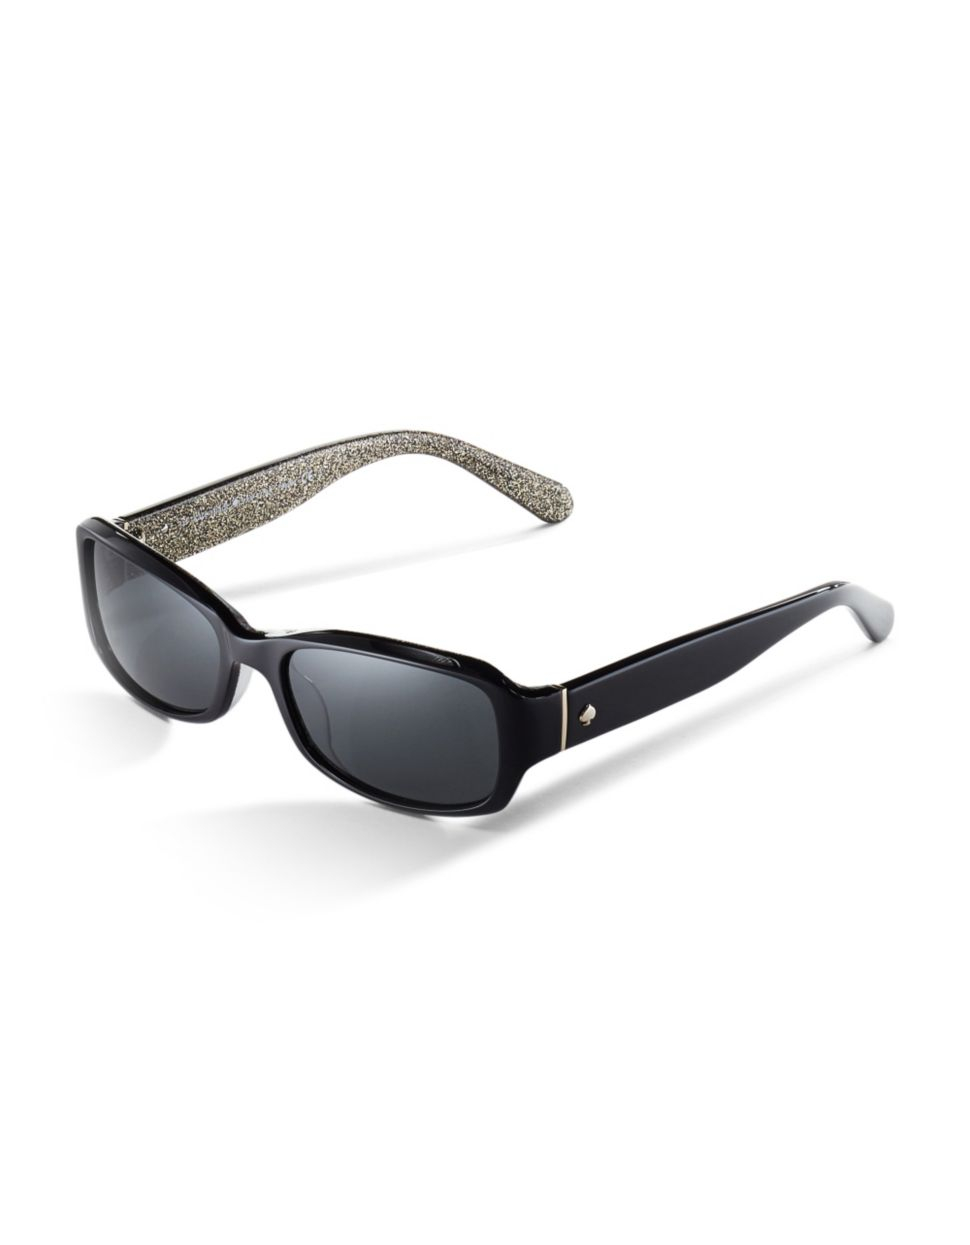 Kate Spade Adley Sunglasses in Black